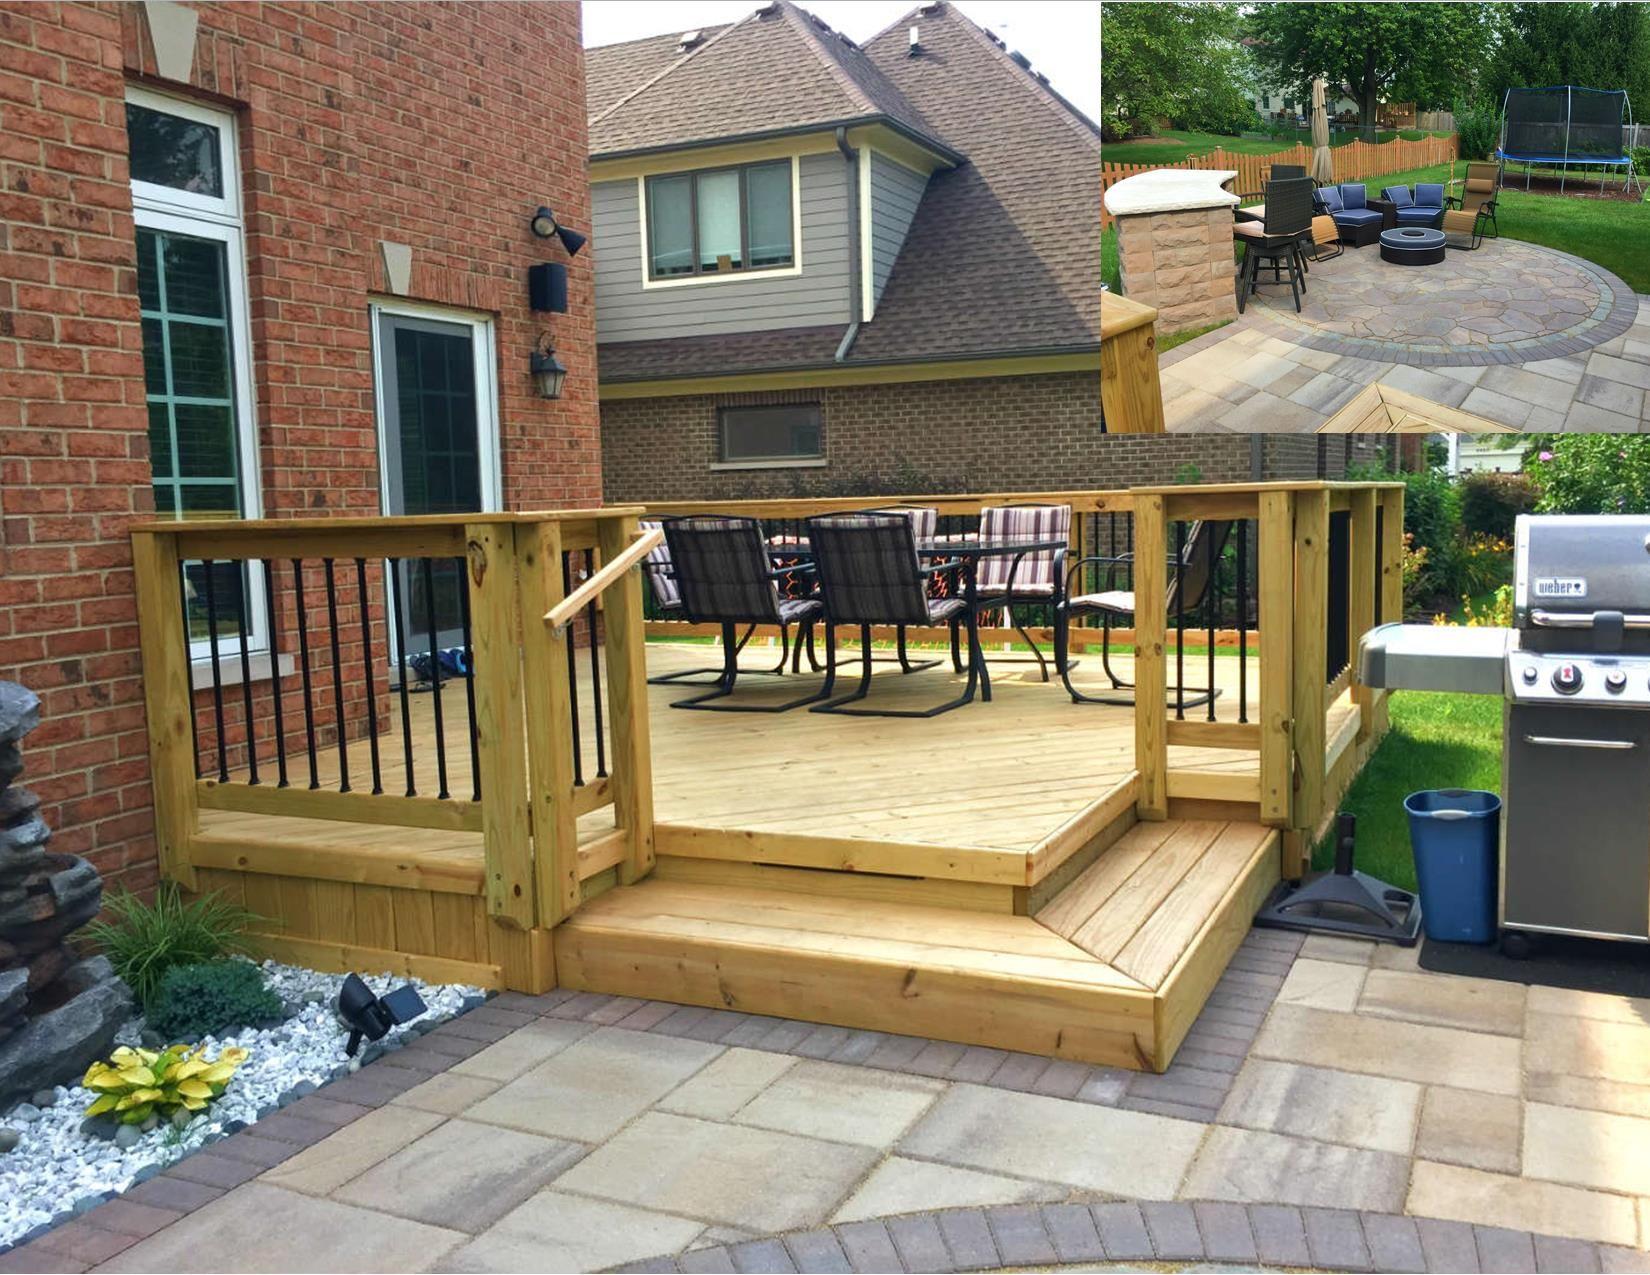 Wood Deck and Belgard Paver Patio Design